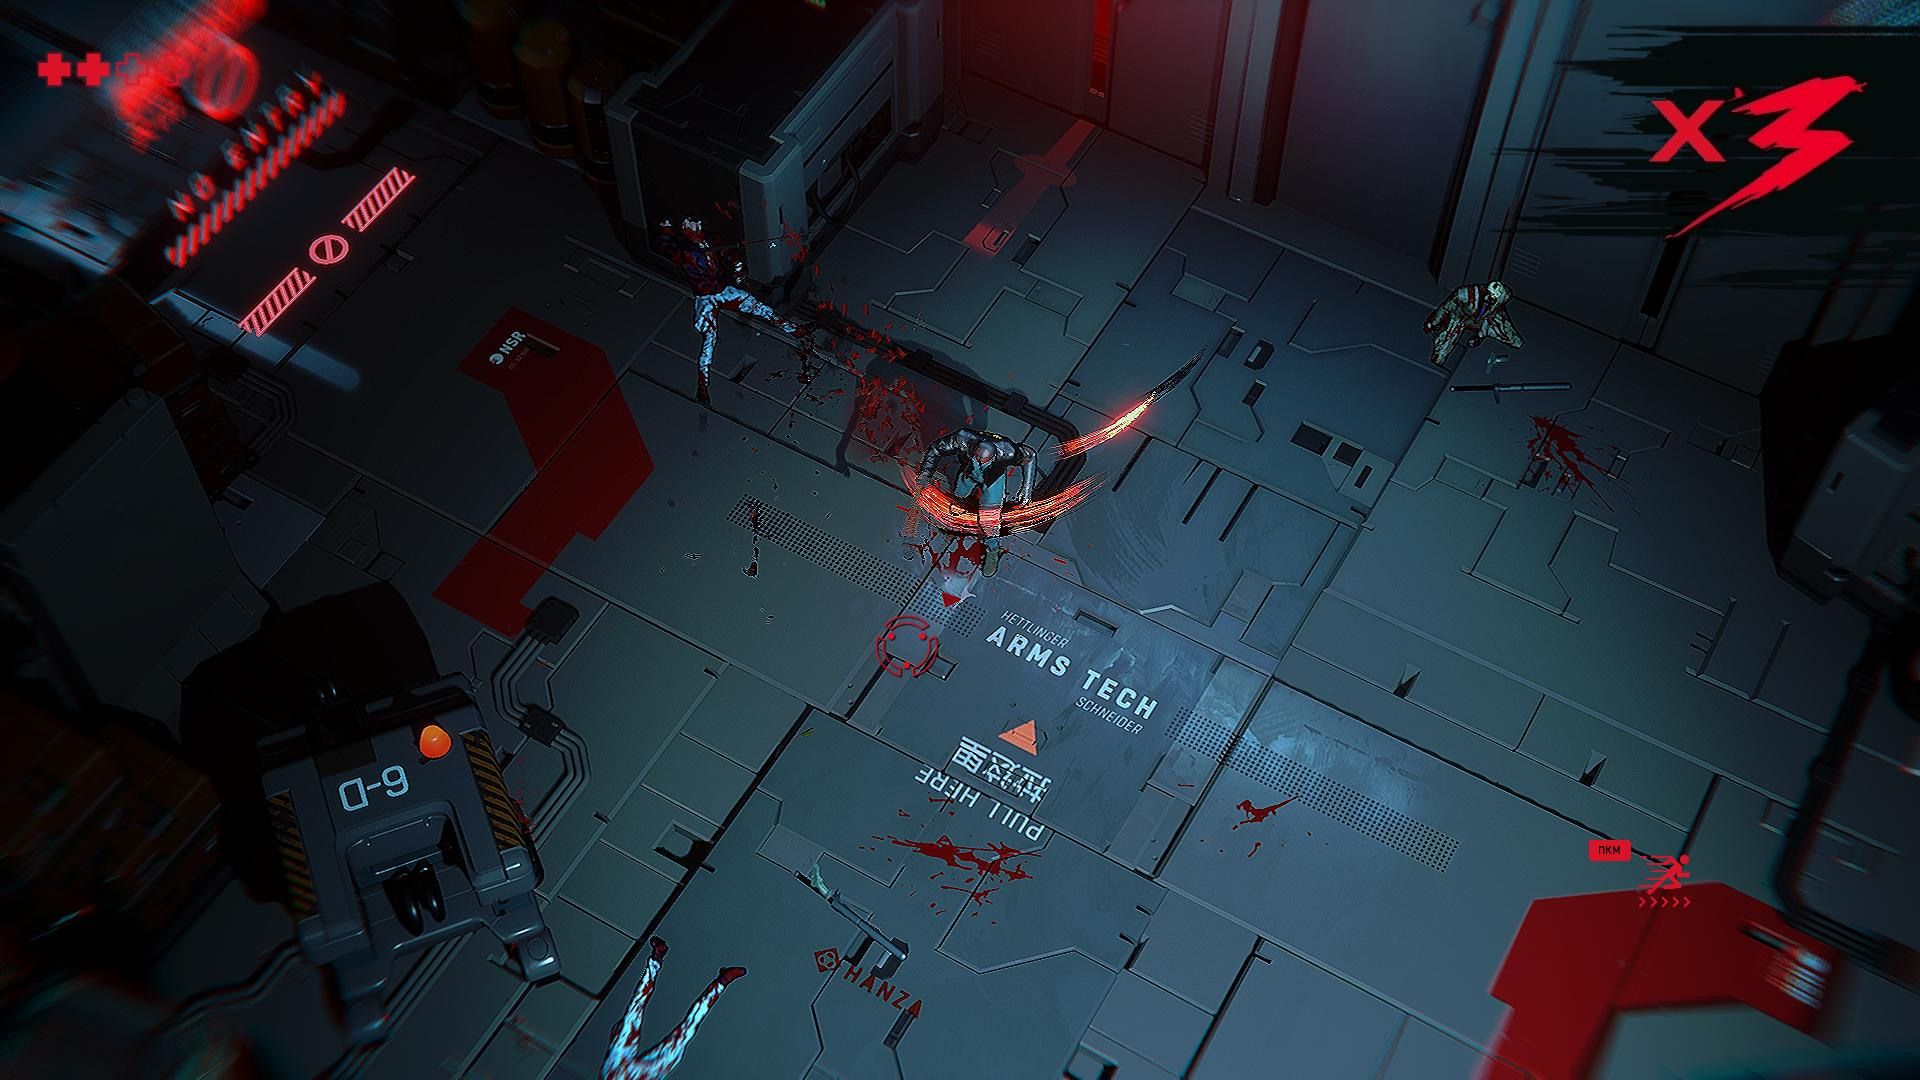 Скриншоты к Ruiner: Annihilation v1.06 на русском полная версия